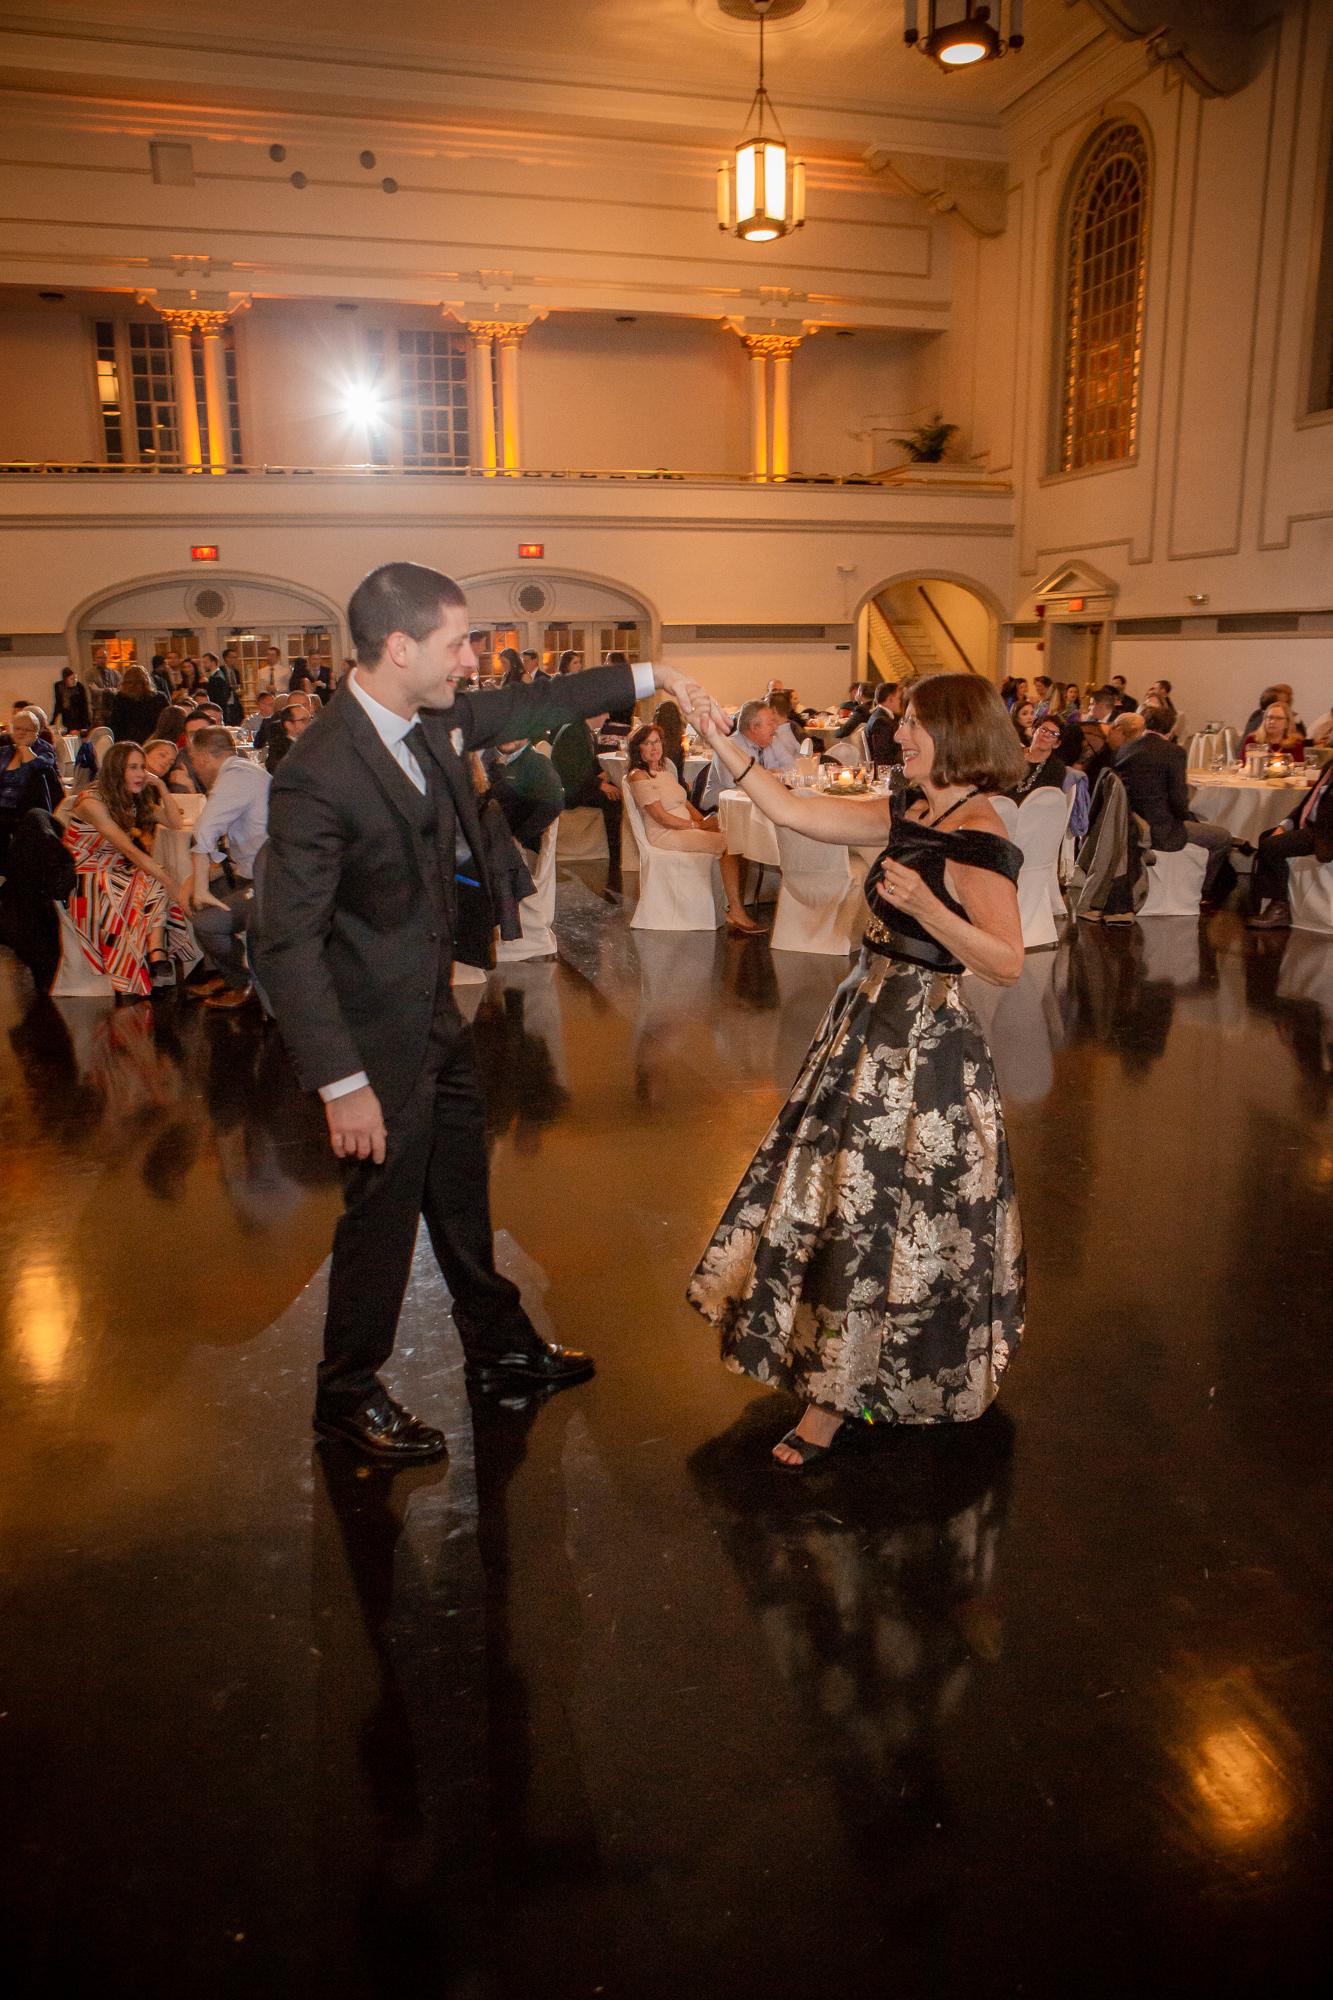 Harro-East-Theatre-and-Ballroom-wedding-8133.jpg